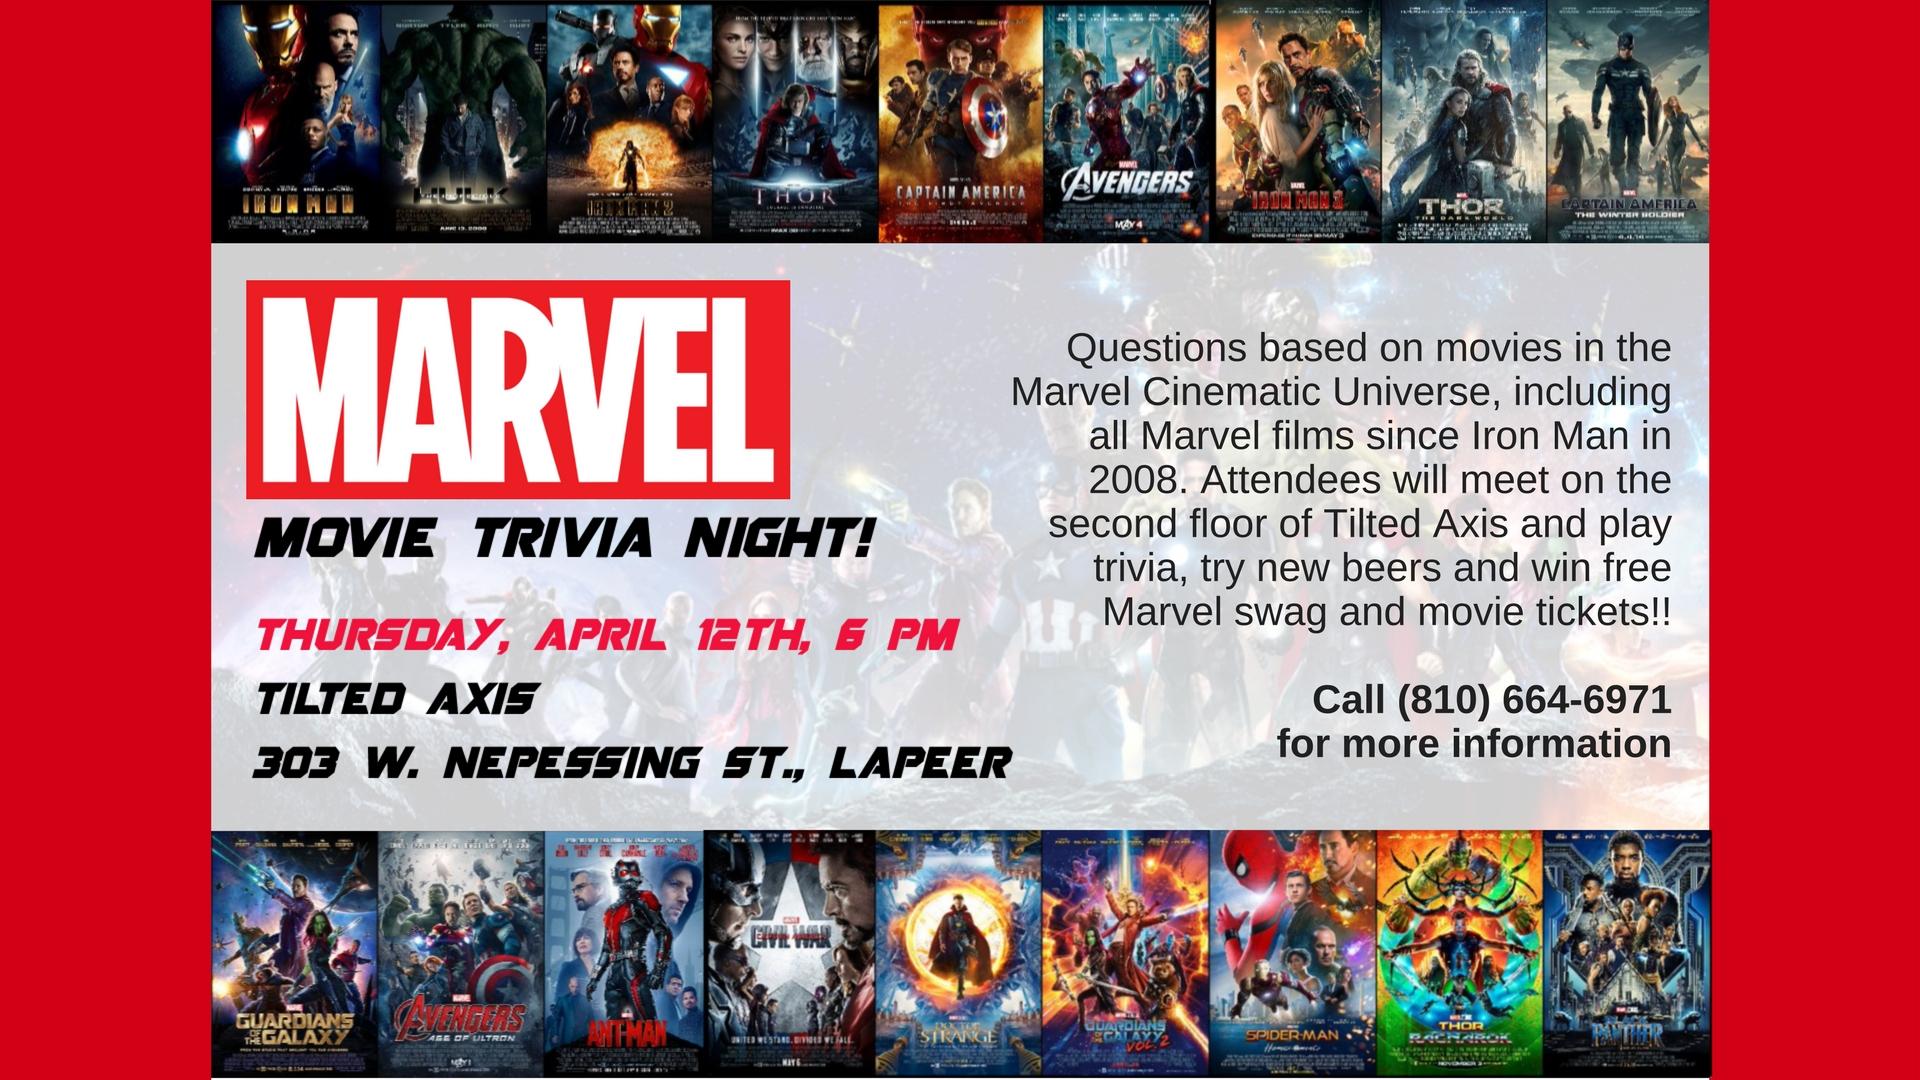 Marvel Movie trivia night - Thursday, April 12, 2018, 6:00 PM - Lapeer